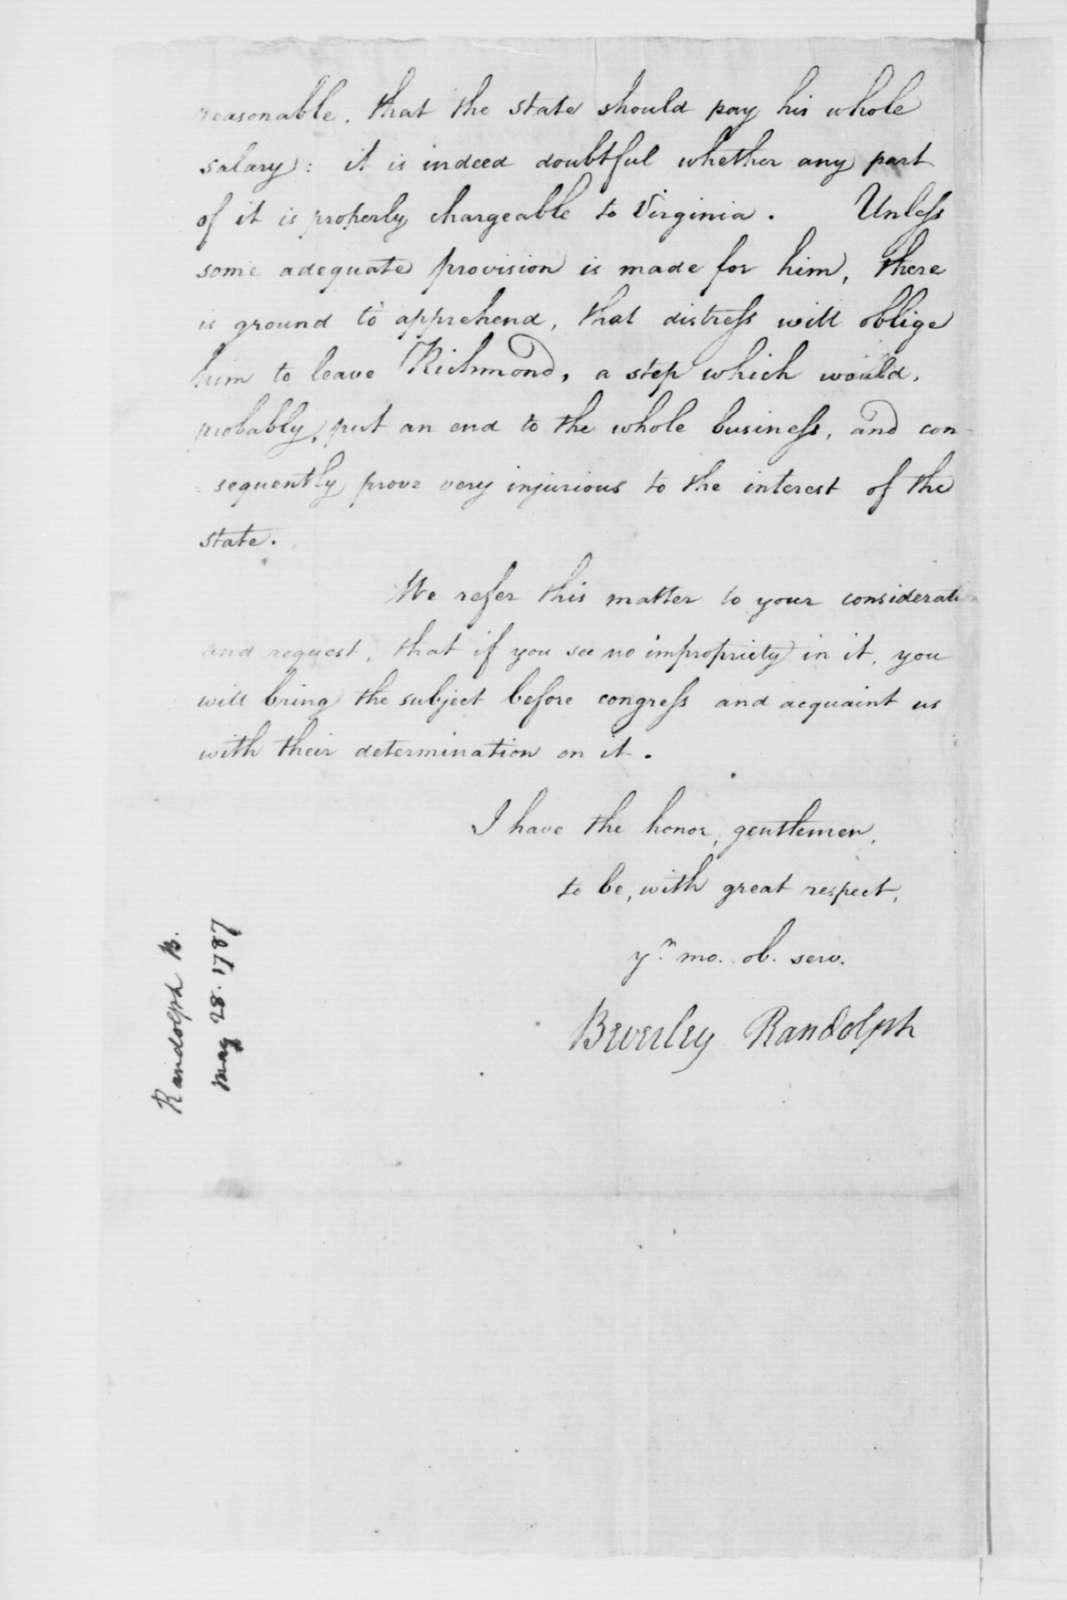 Beverley Randolph to Virginia Congressional Delegates, May 28, 1787.